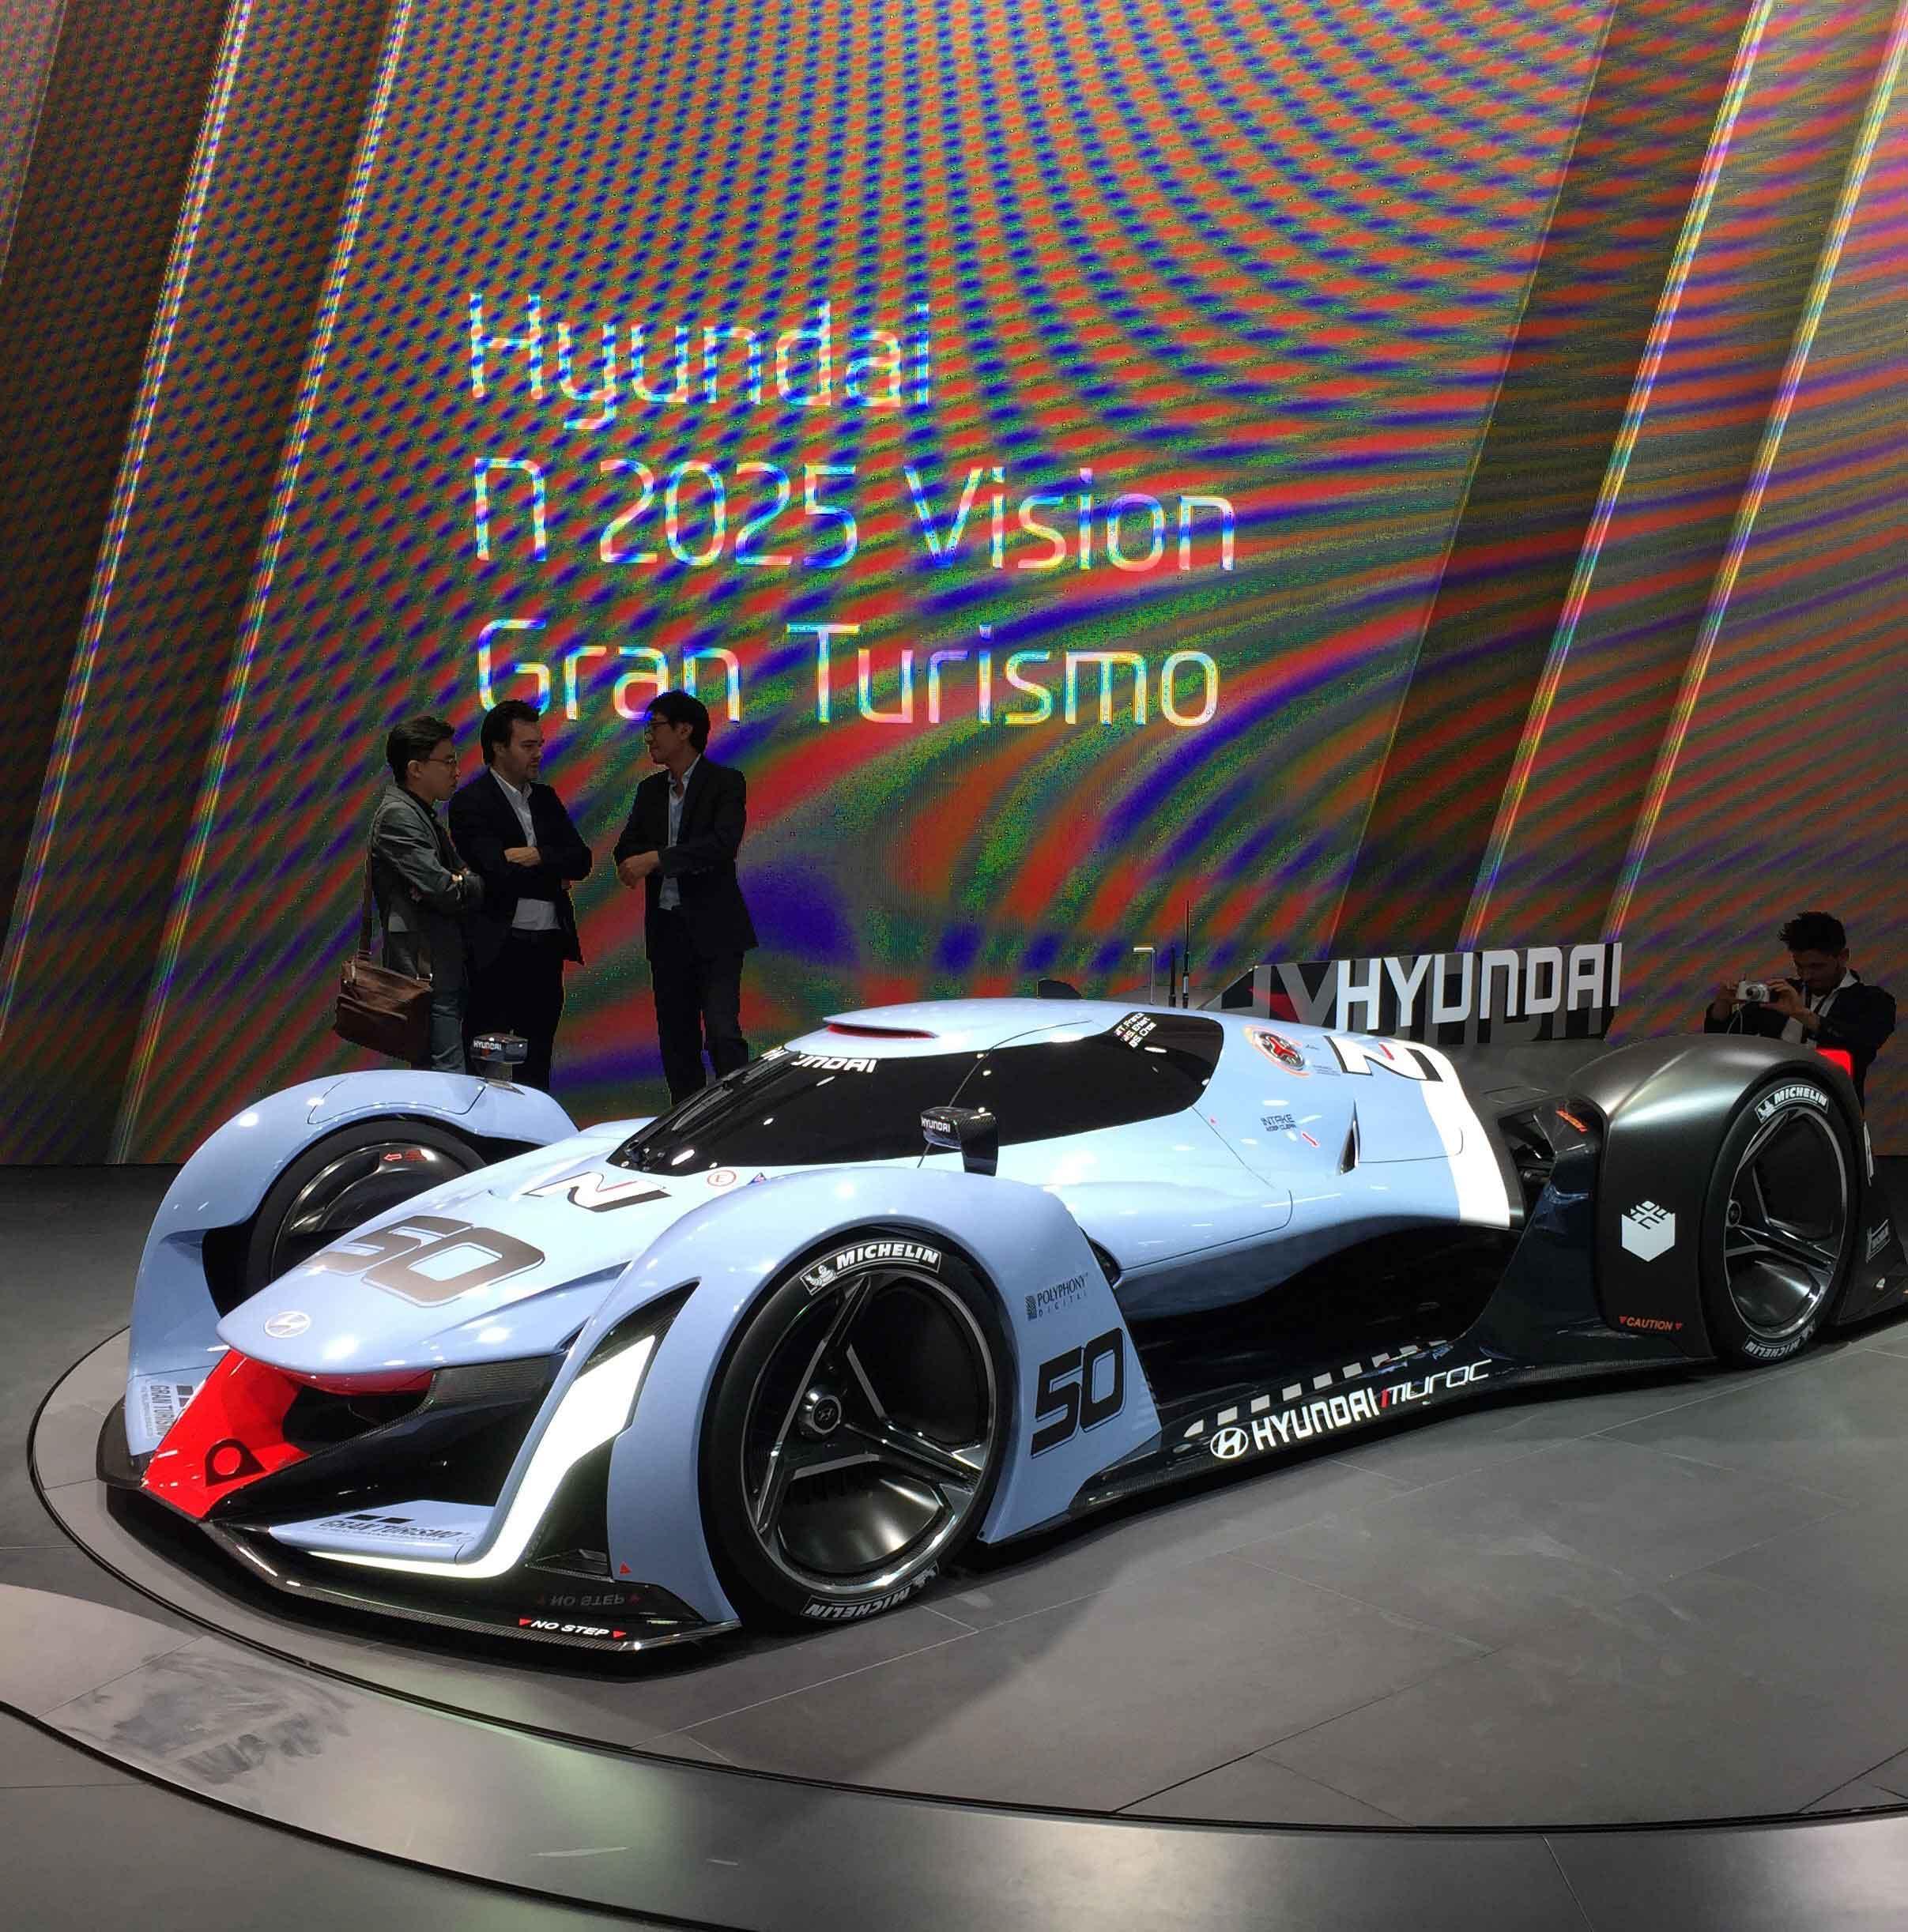 Hyundai N 2025 Vision Gran Turismo | AUTOMOTIVE RHYTHMS